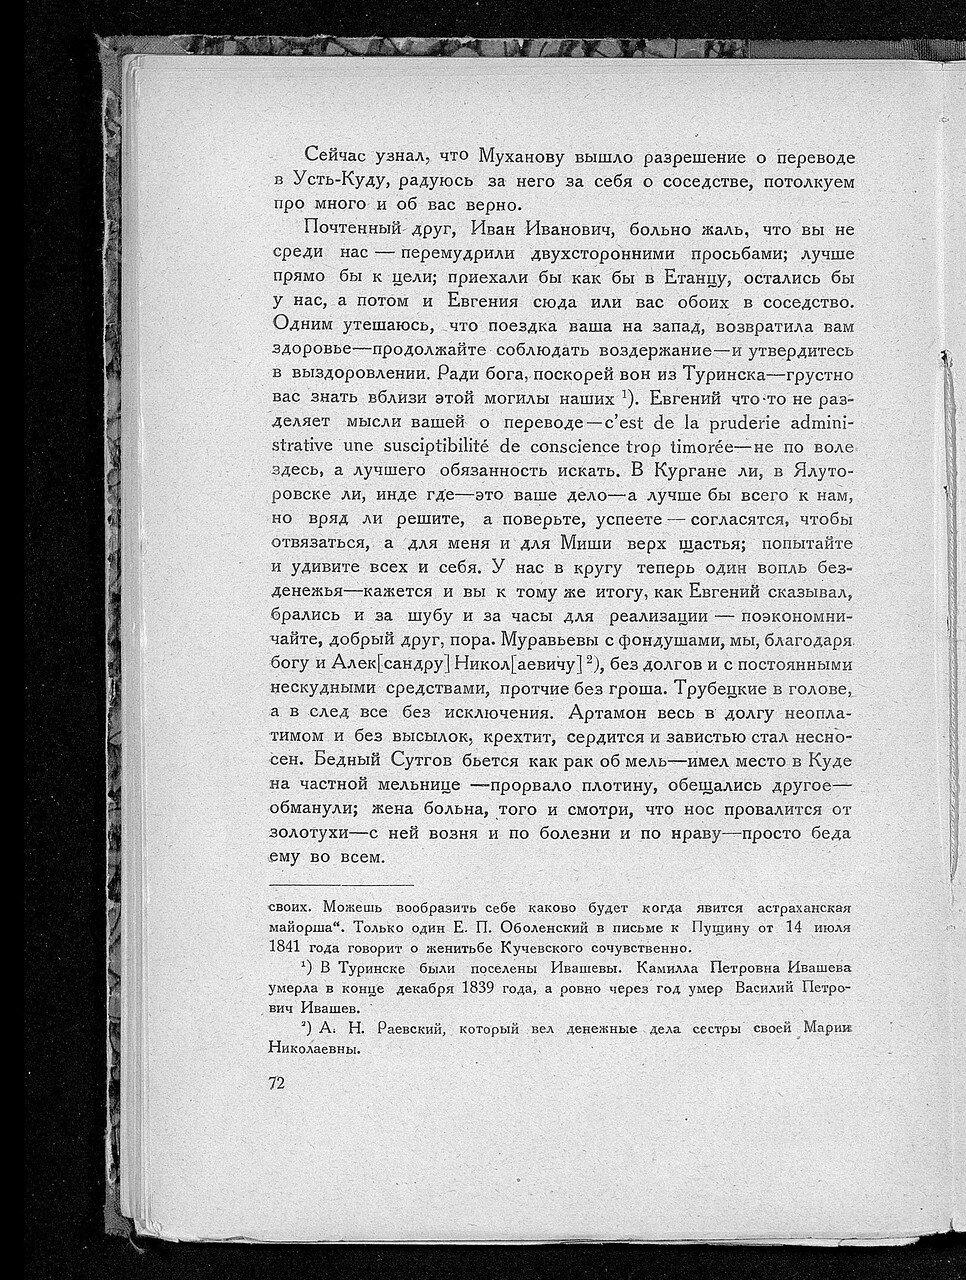 https://img-fotki.yandex.ru/get/879536/199368979.a1/0_214343_cf9f912d_XXXL.jpg